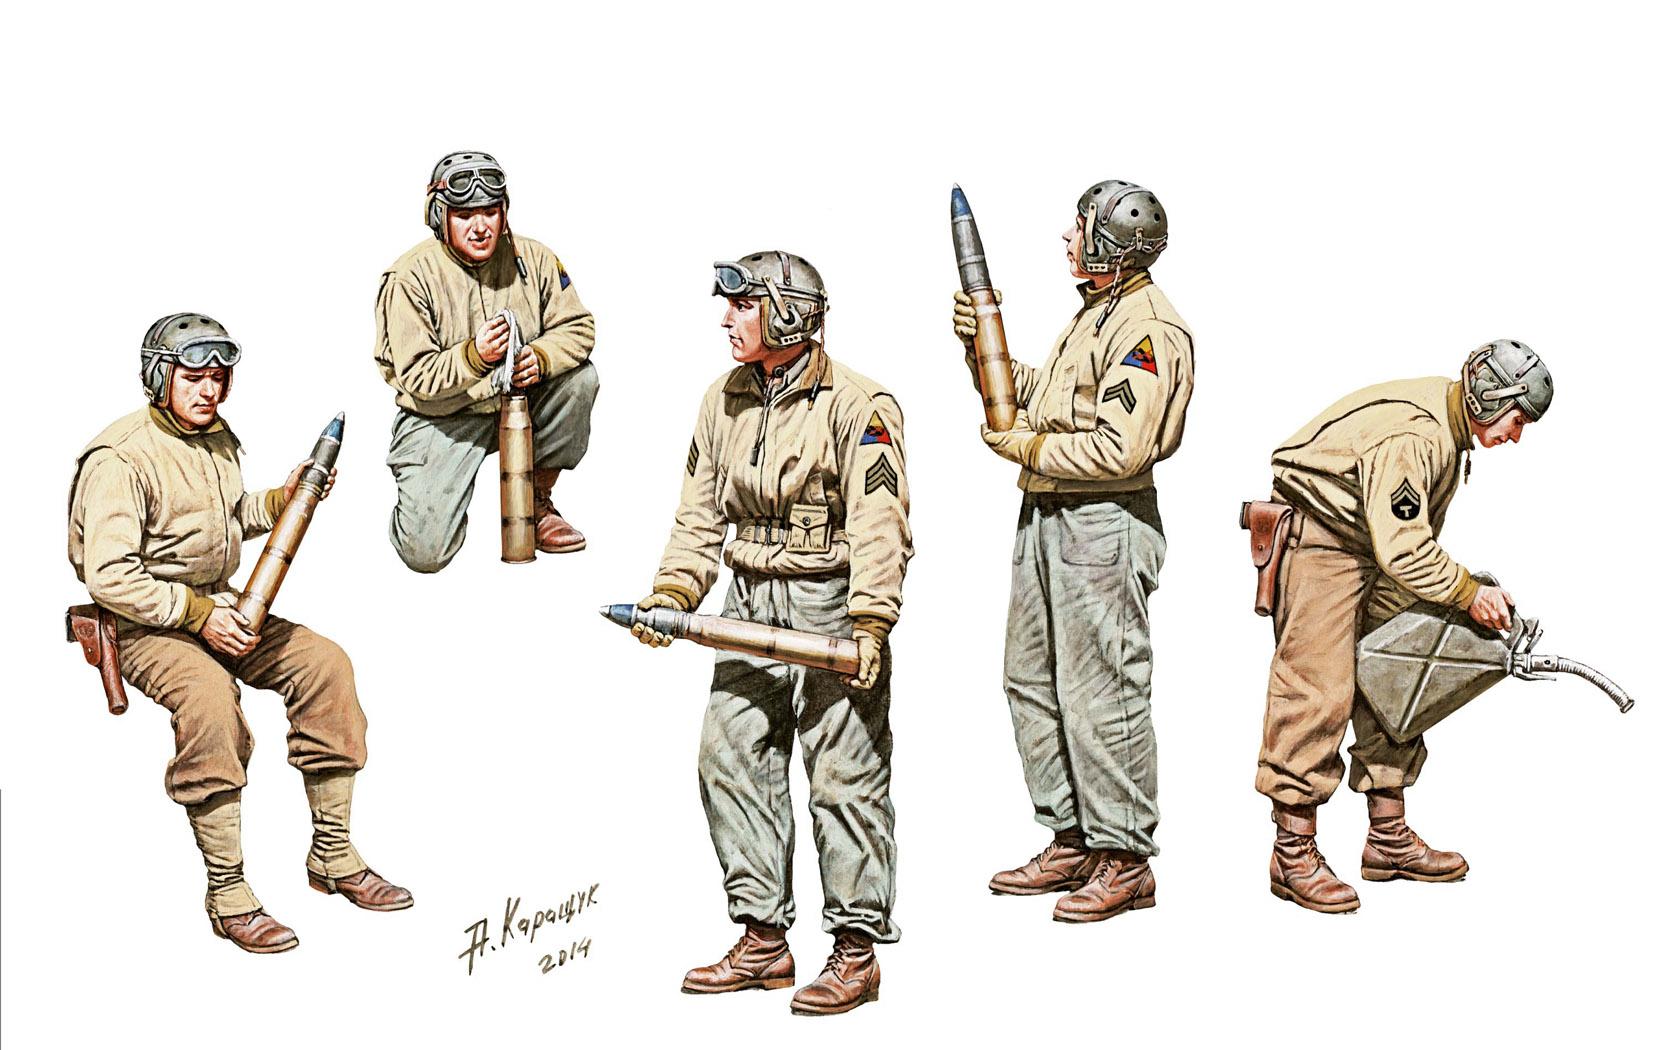 рисунок U.S. AMMO-LOADING TANK CREW